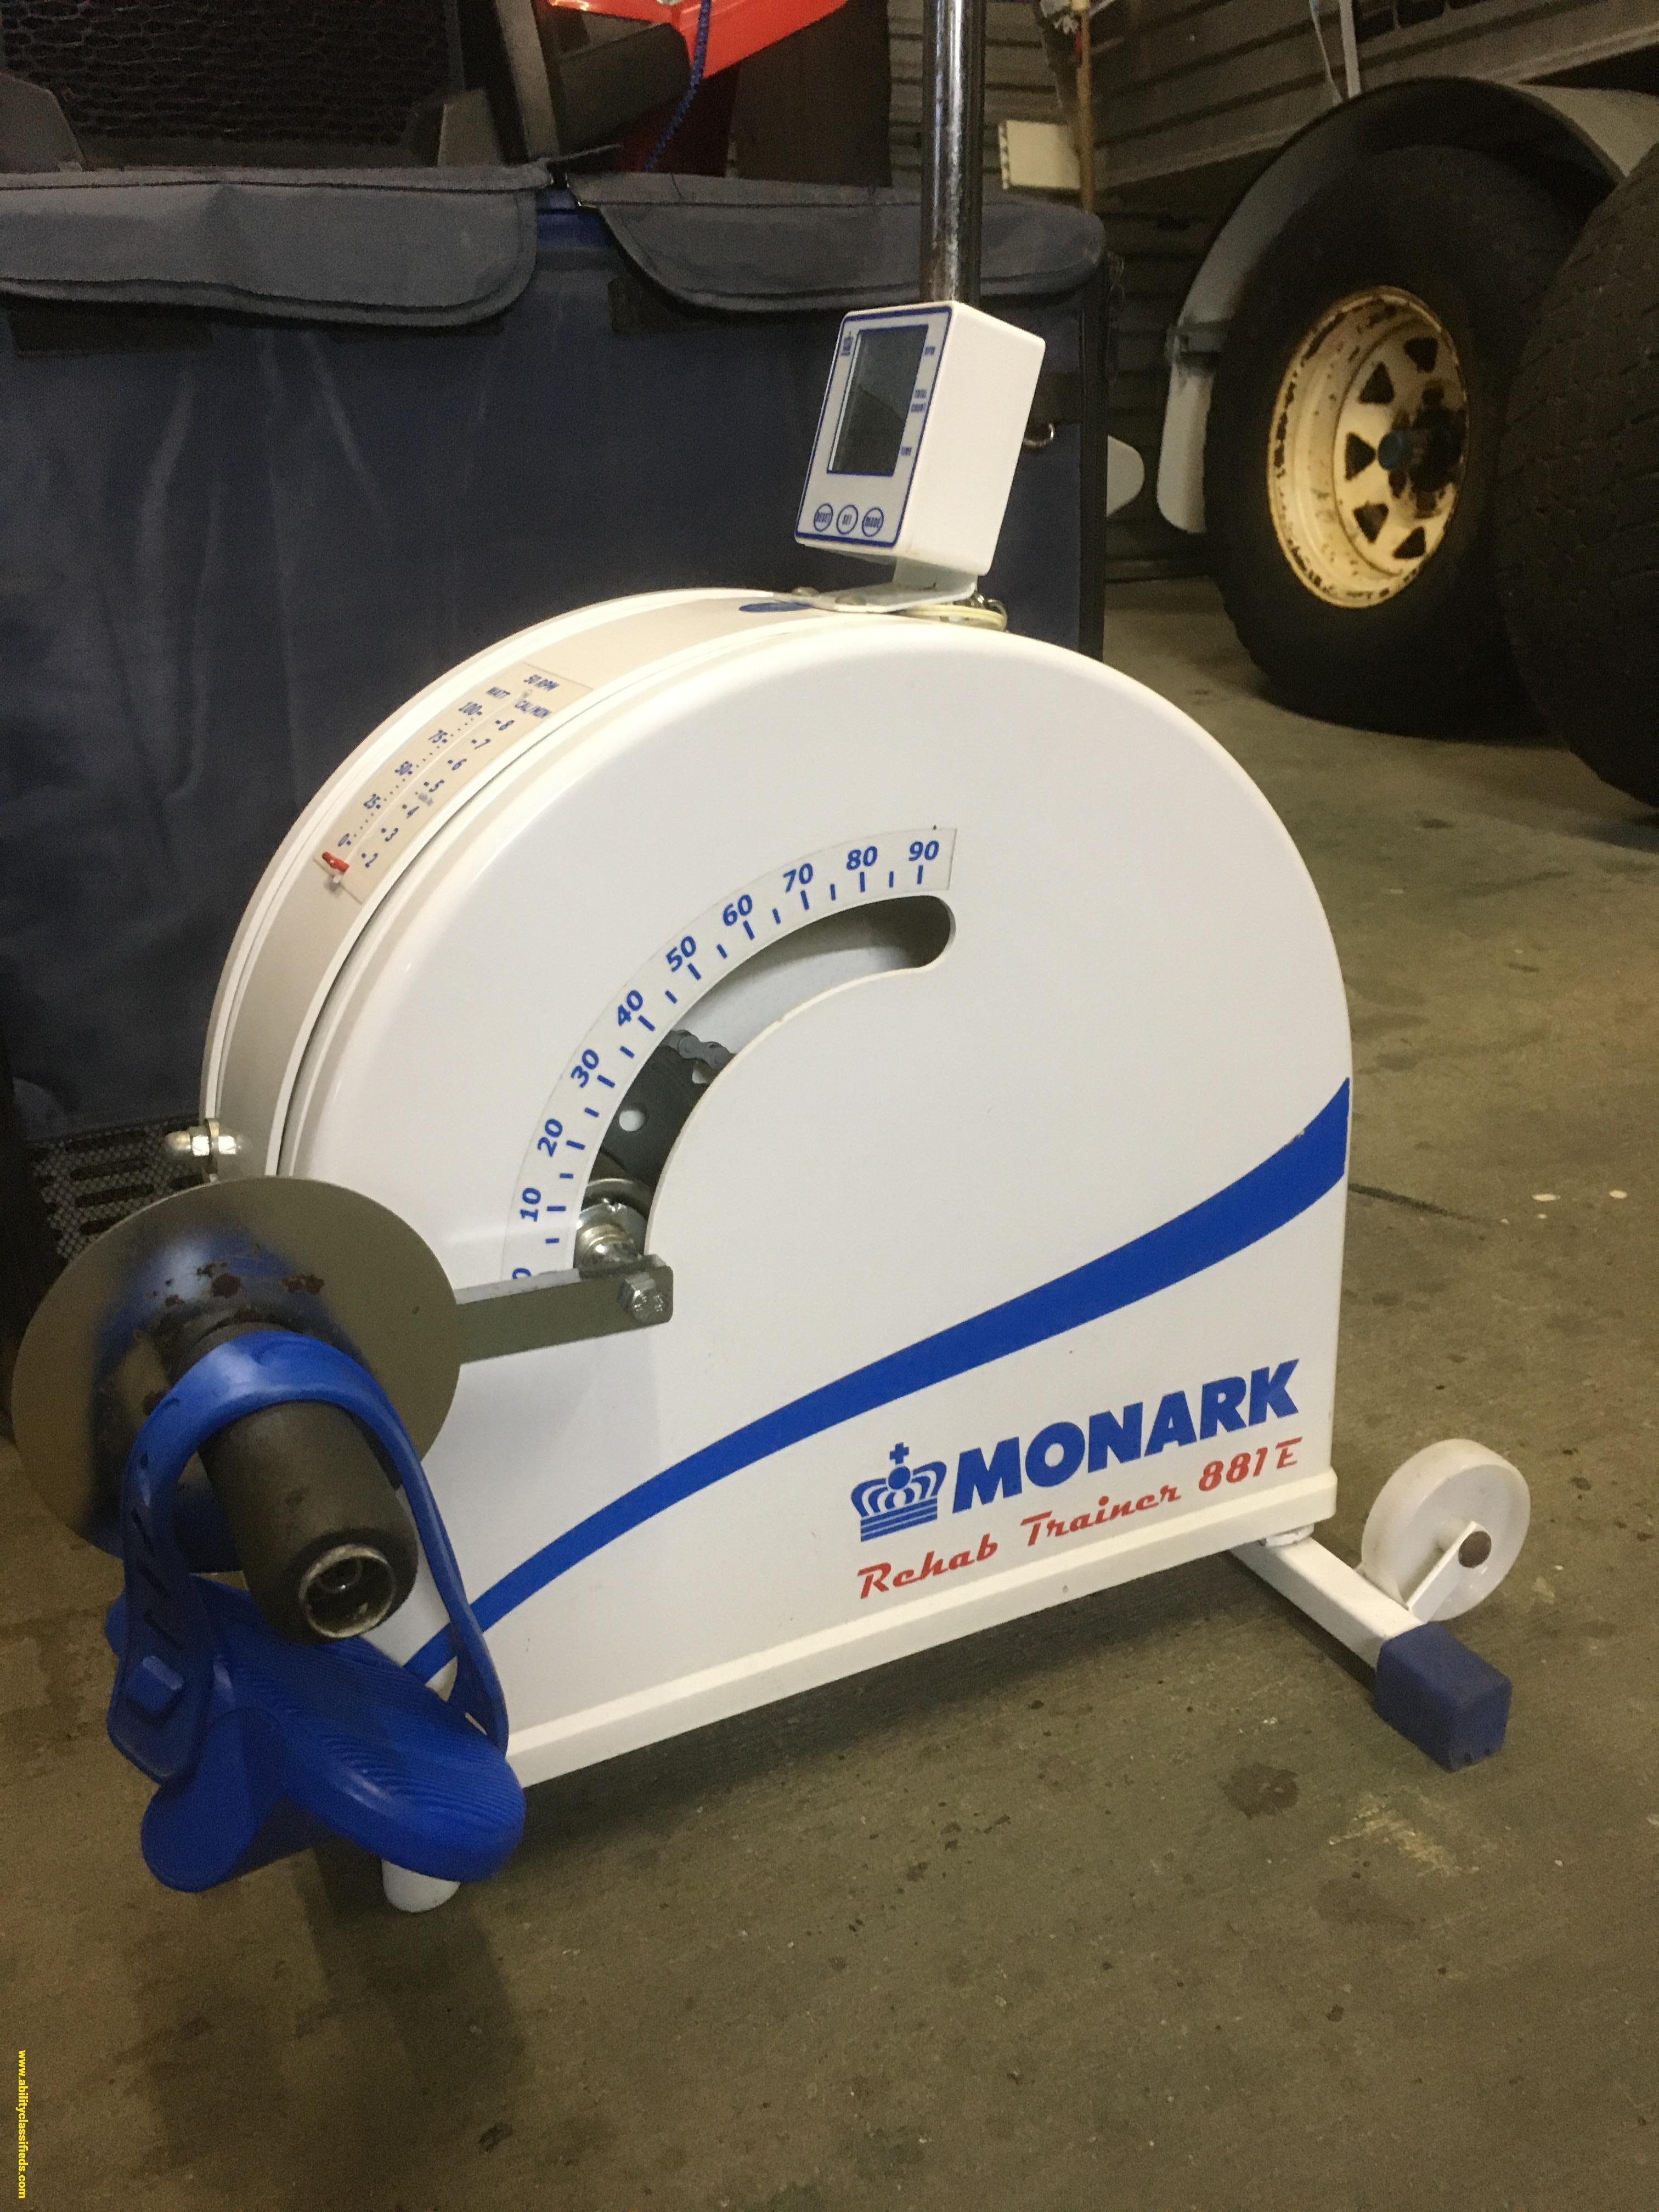 Monark Rehabilitation Trainer